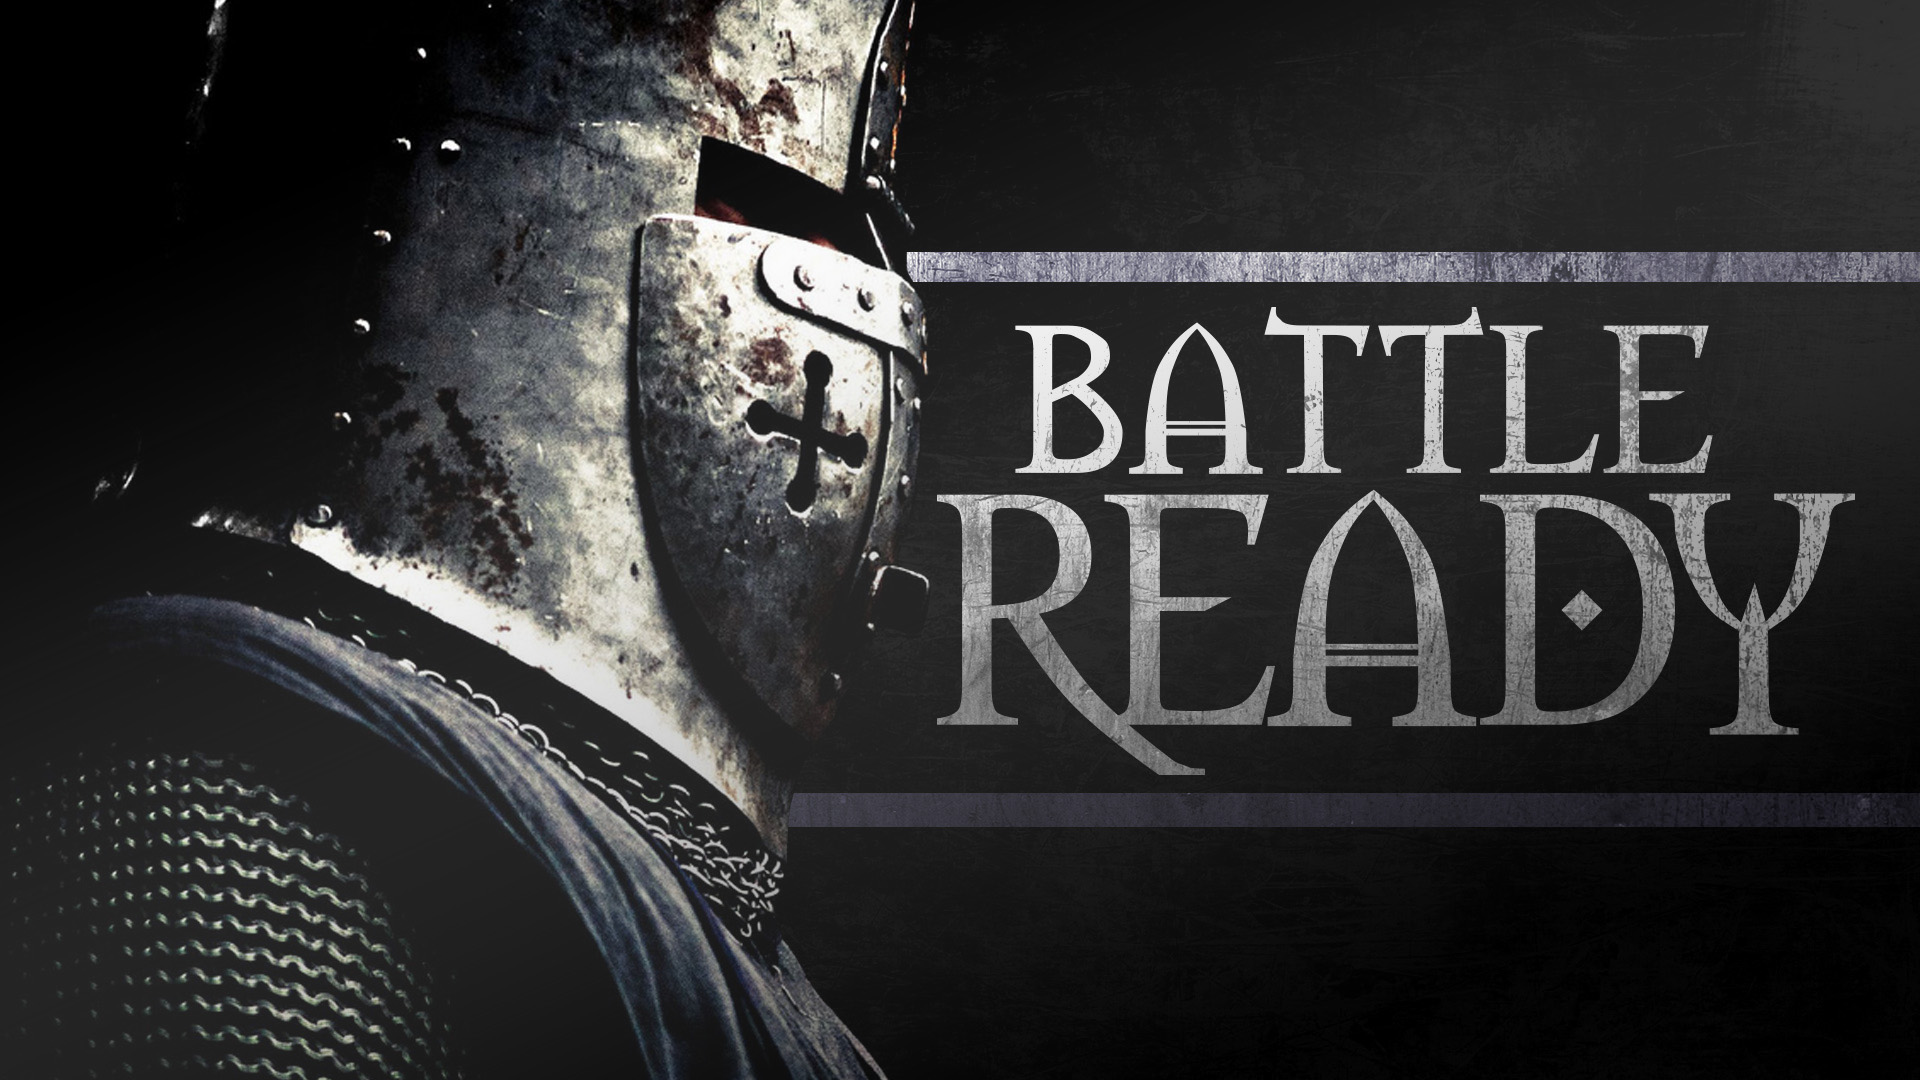 Battle Ready Graphic.jpg